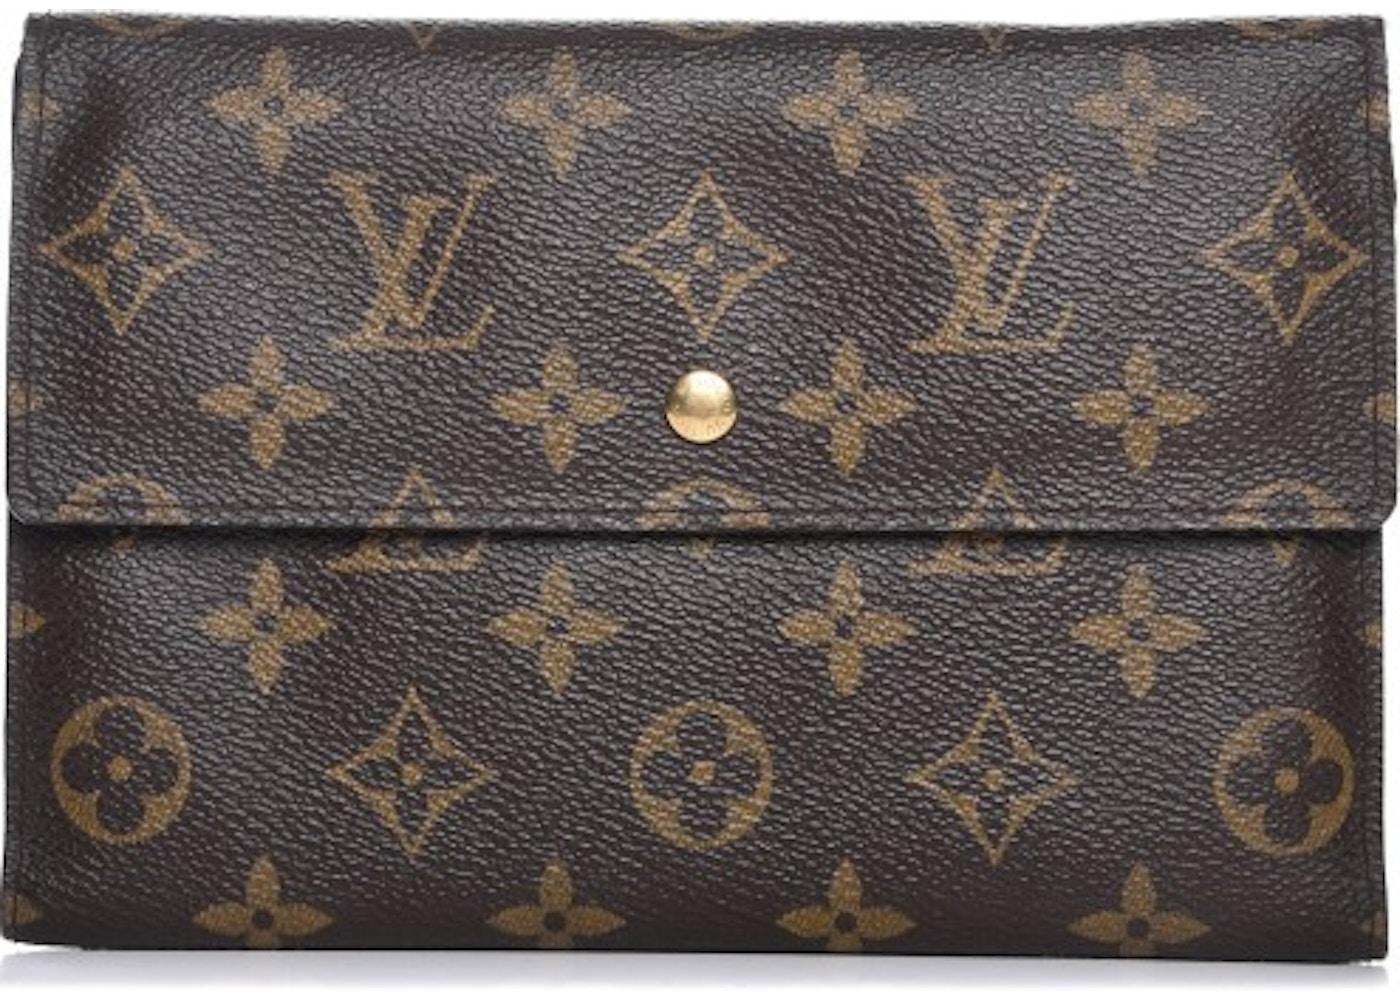 308b5a32e775 Louis Vuitton Wallet Passport Organizer Monogram Brown. Monogram Brown